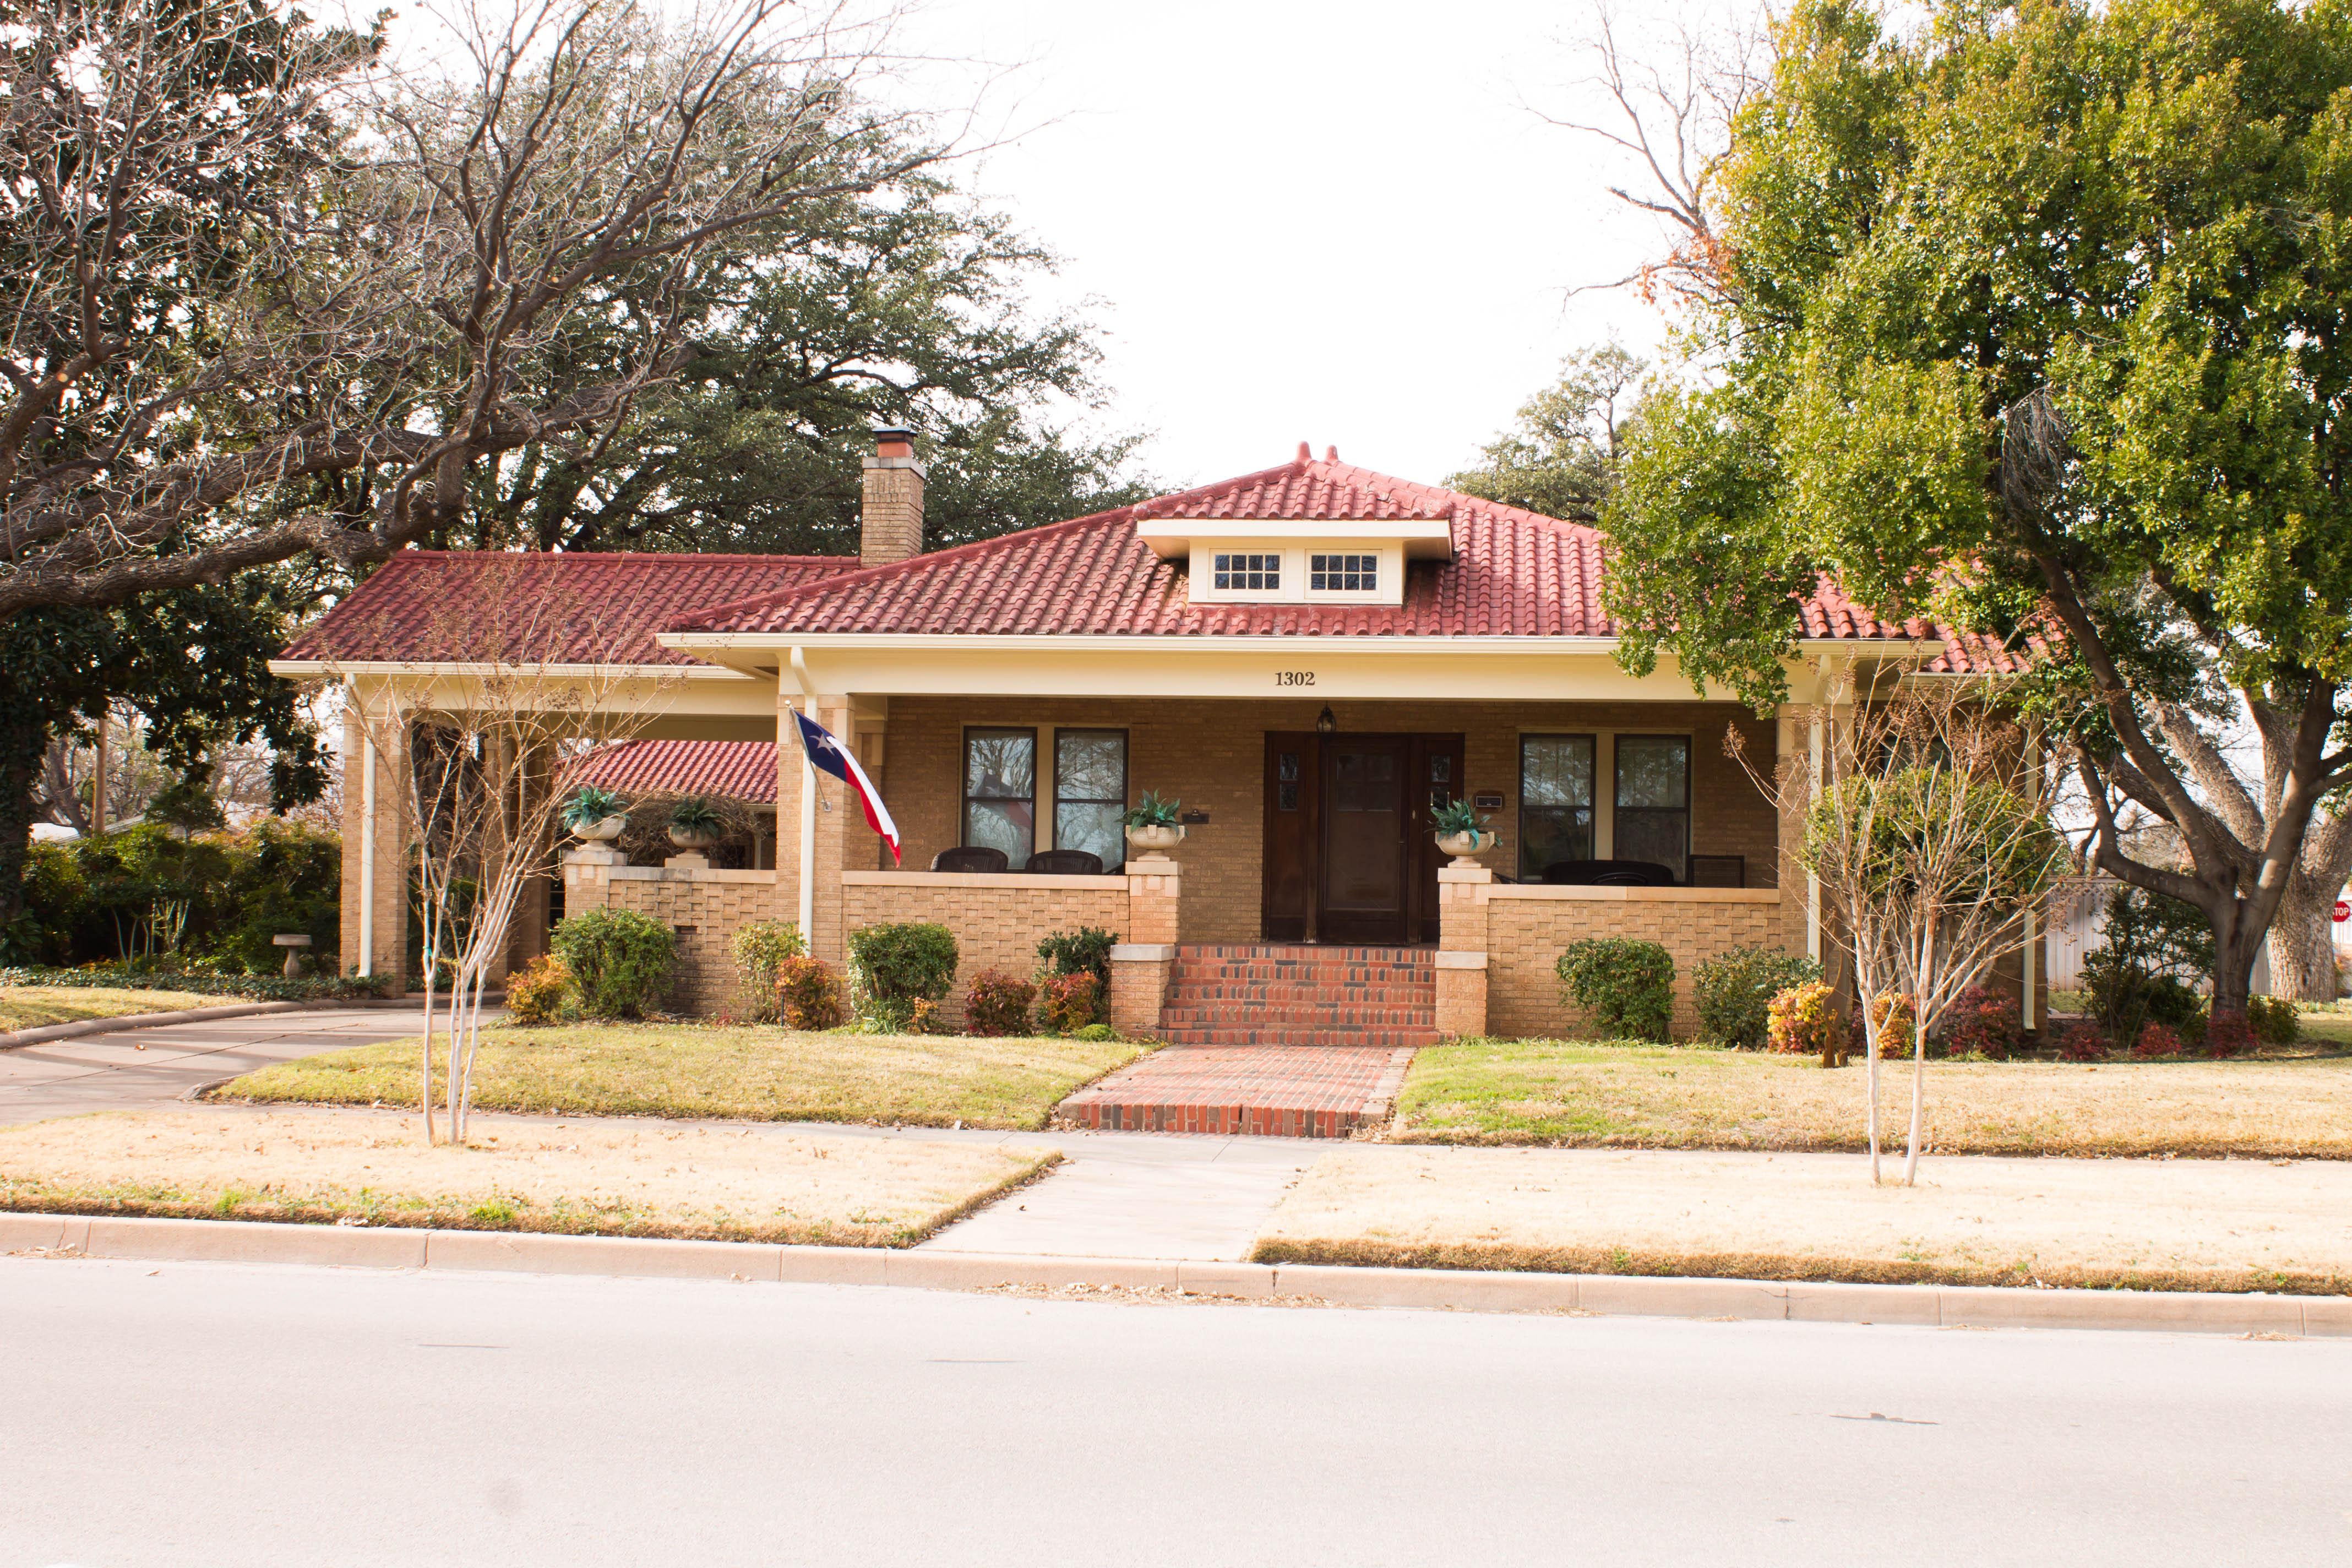 albert s and ruth goodloe house in abilene texas historic places rh historicplaces net